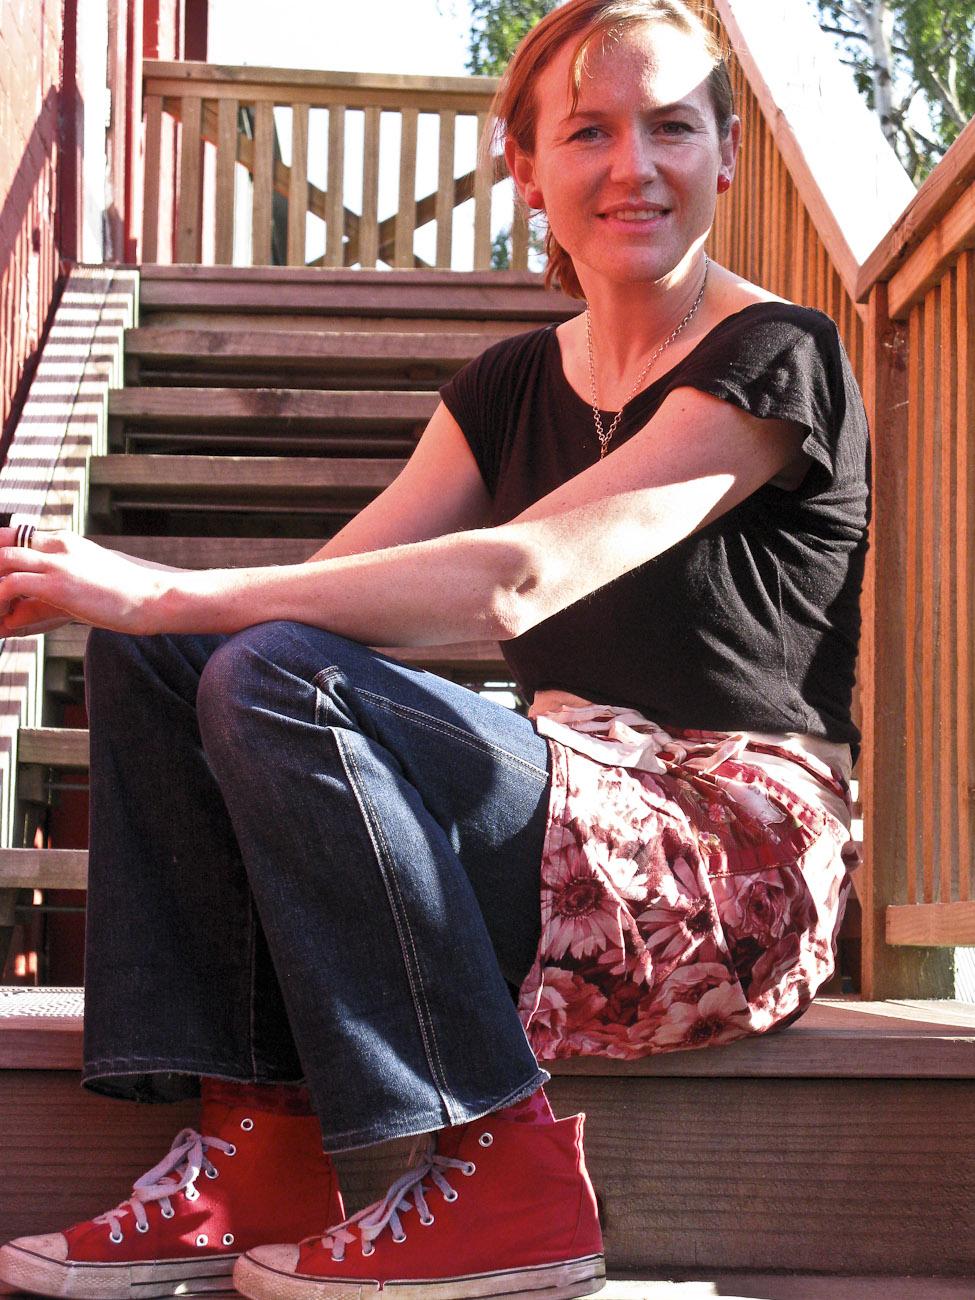 The Pomeroy's Press. Portrait for Pom's staff profile story. Georgie Henderson.